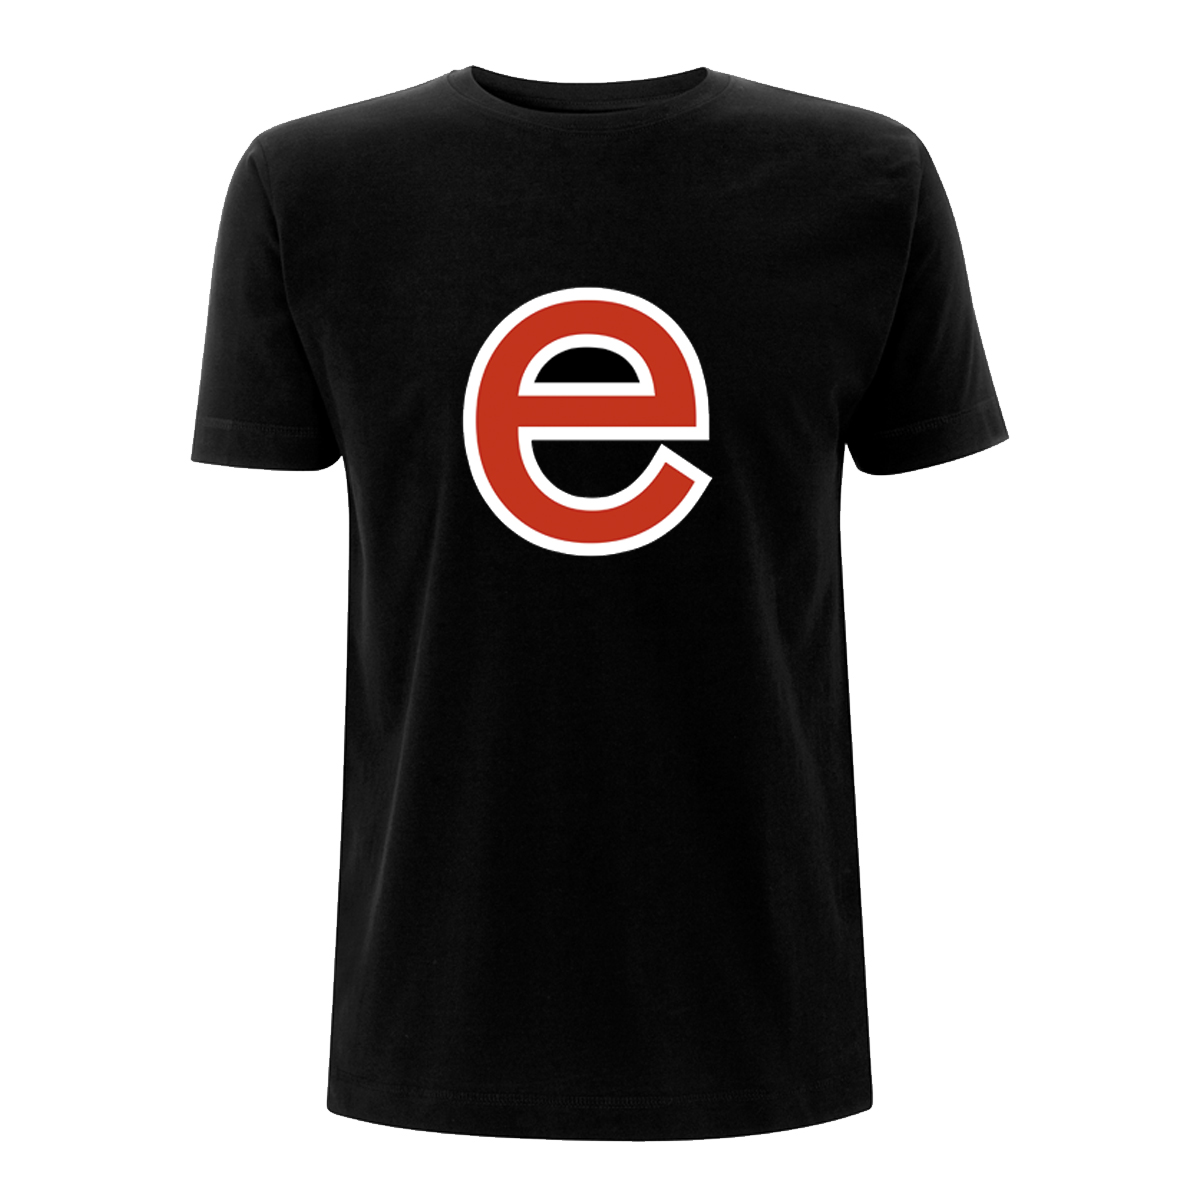 Evil E – Tee - Rage Against the Machine